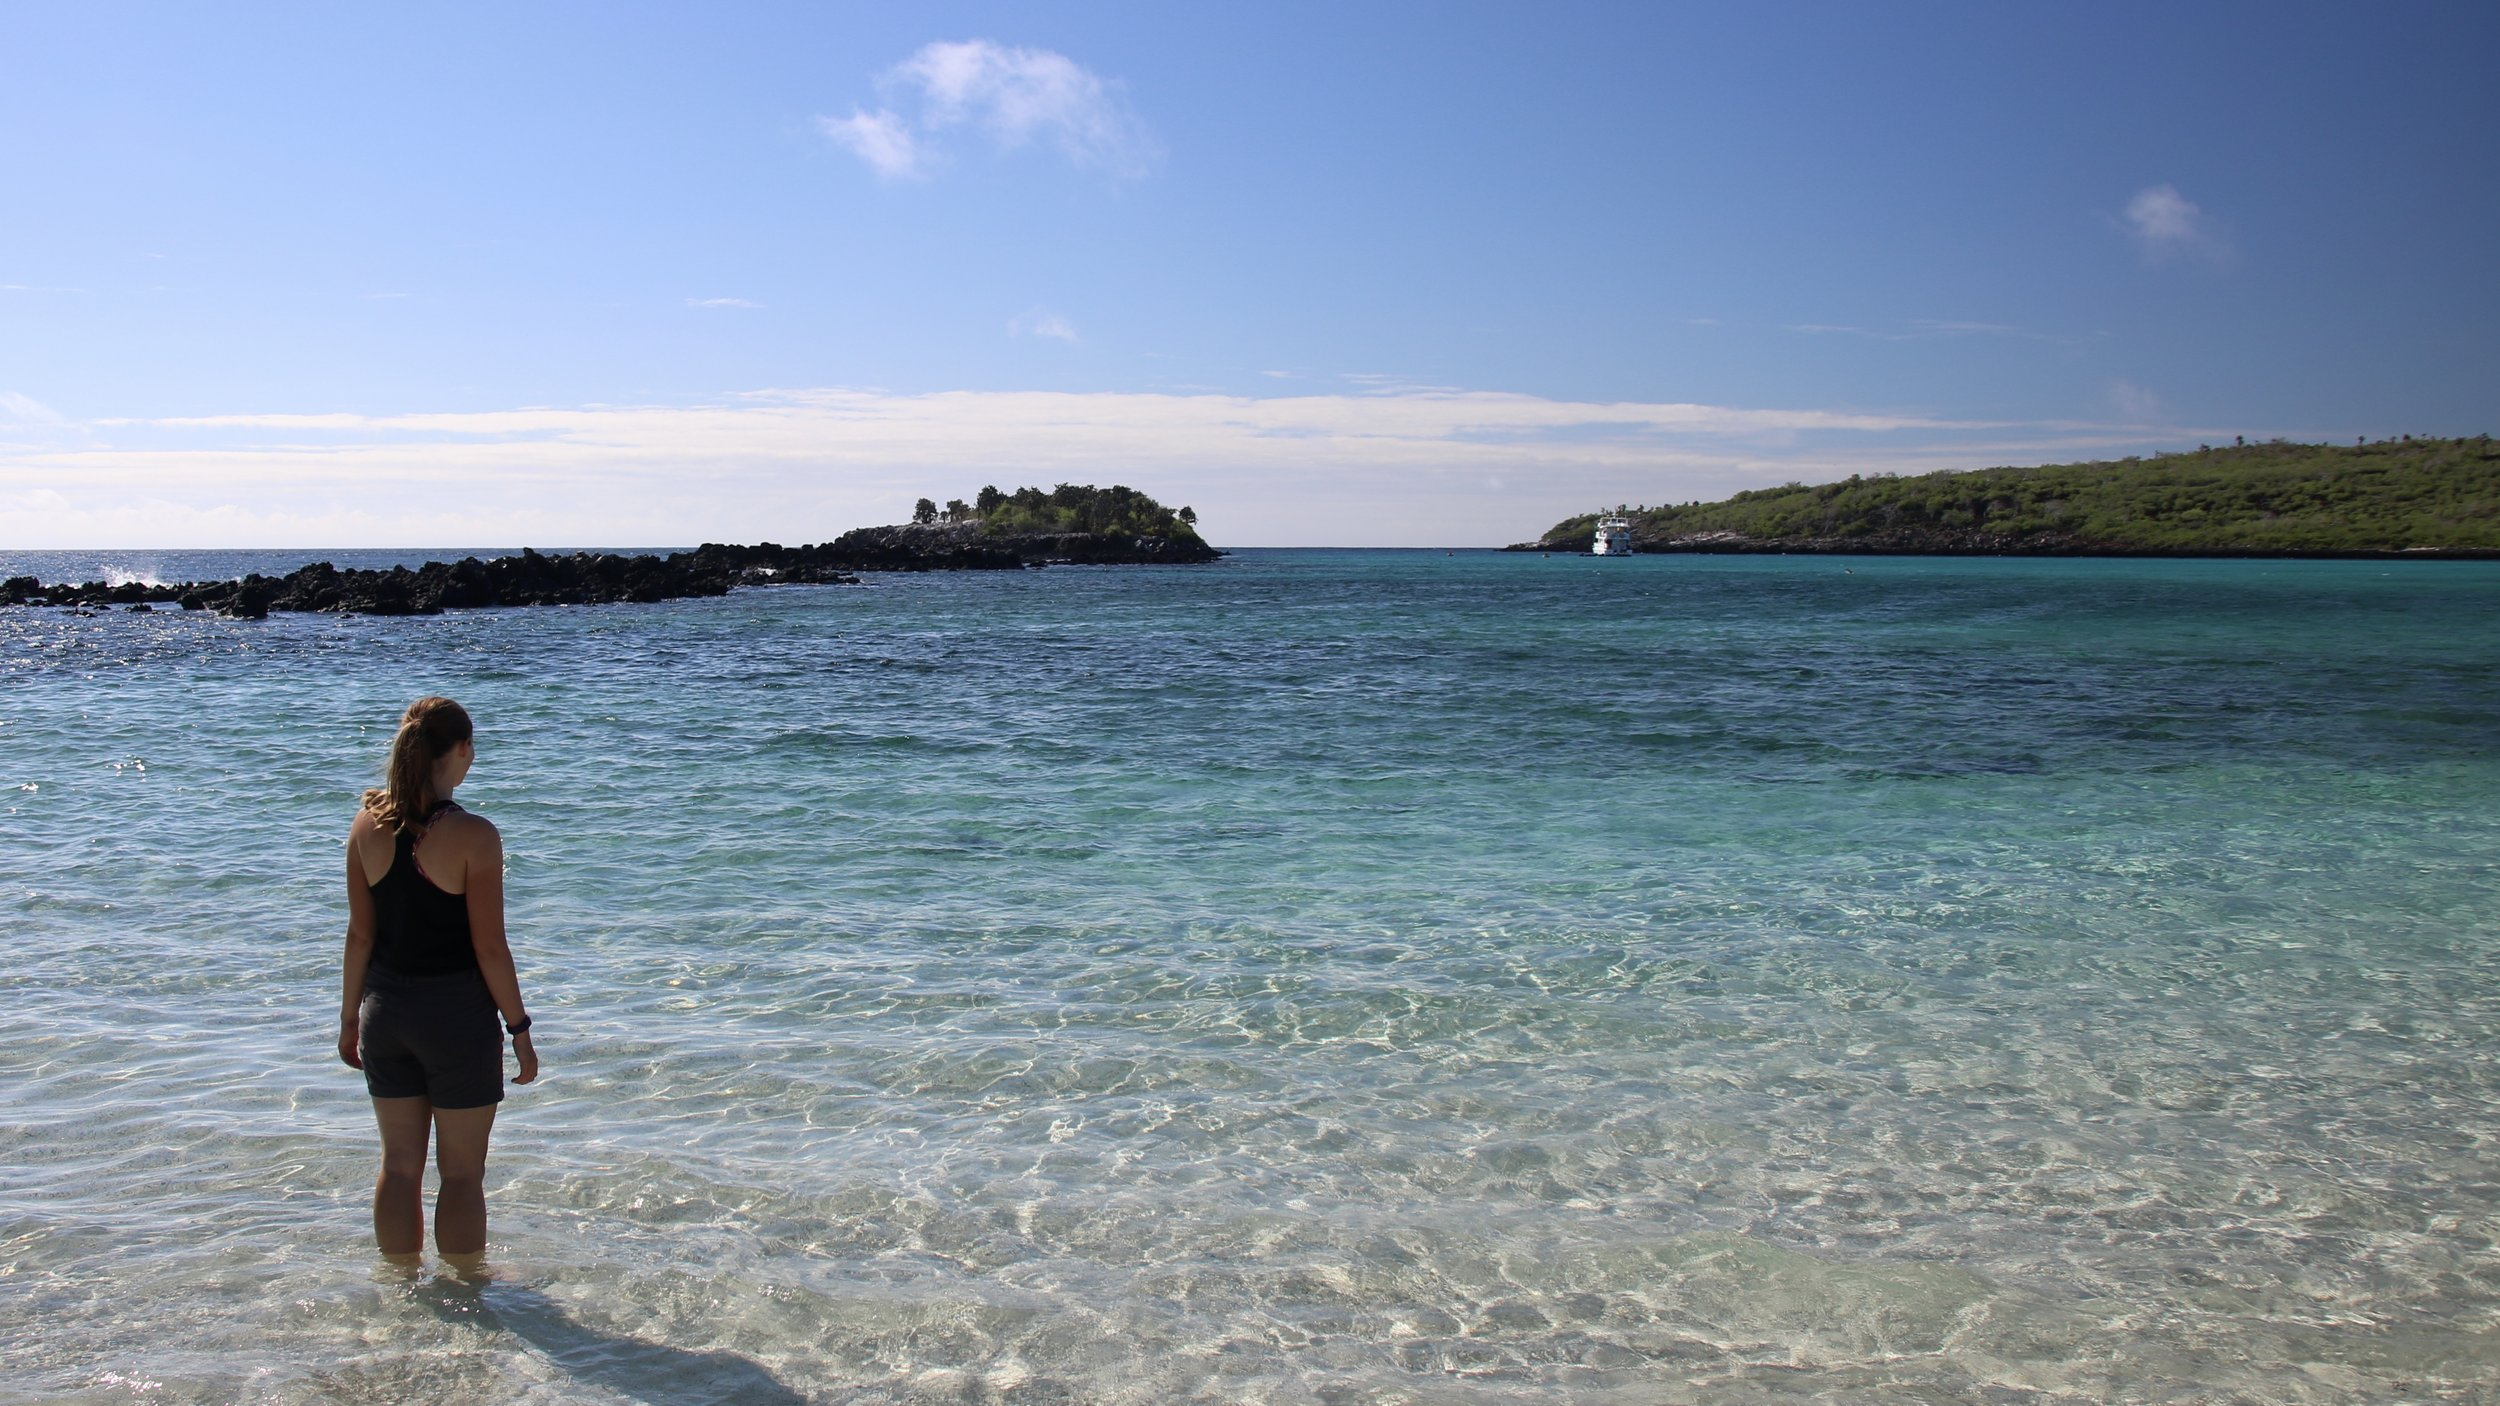 Beach, Galapagos Islands, @acrosslandsea